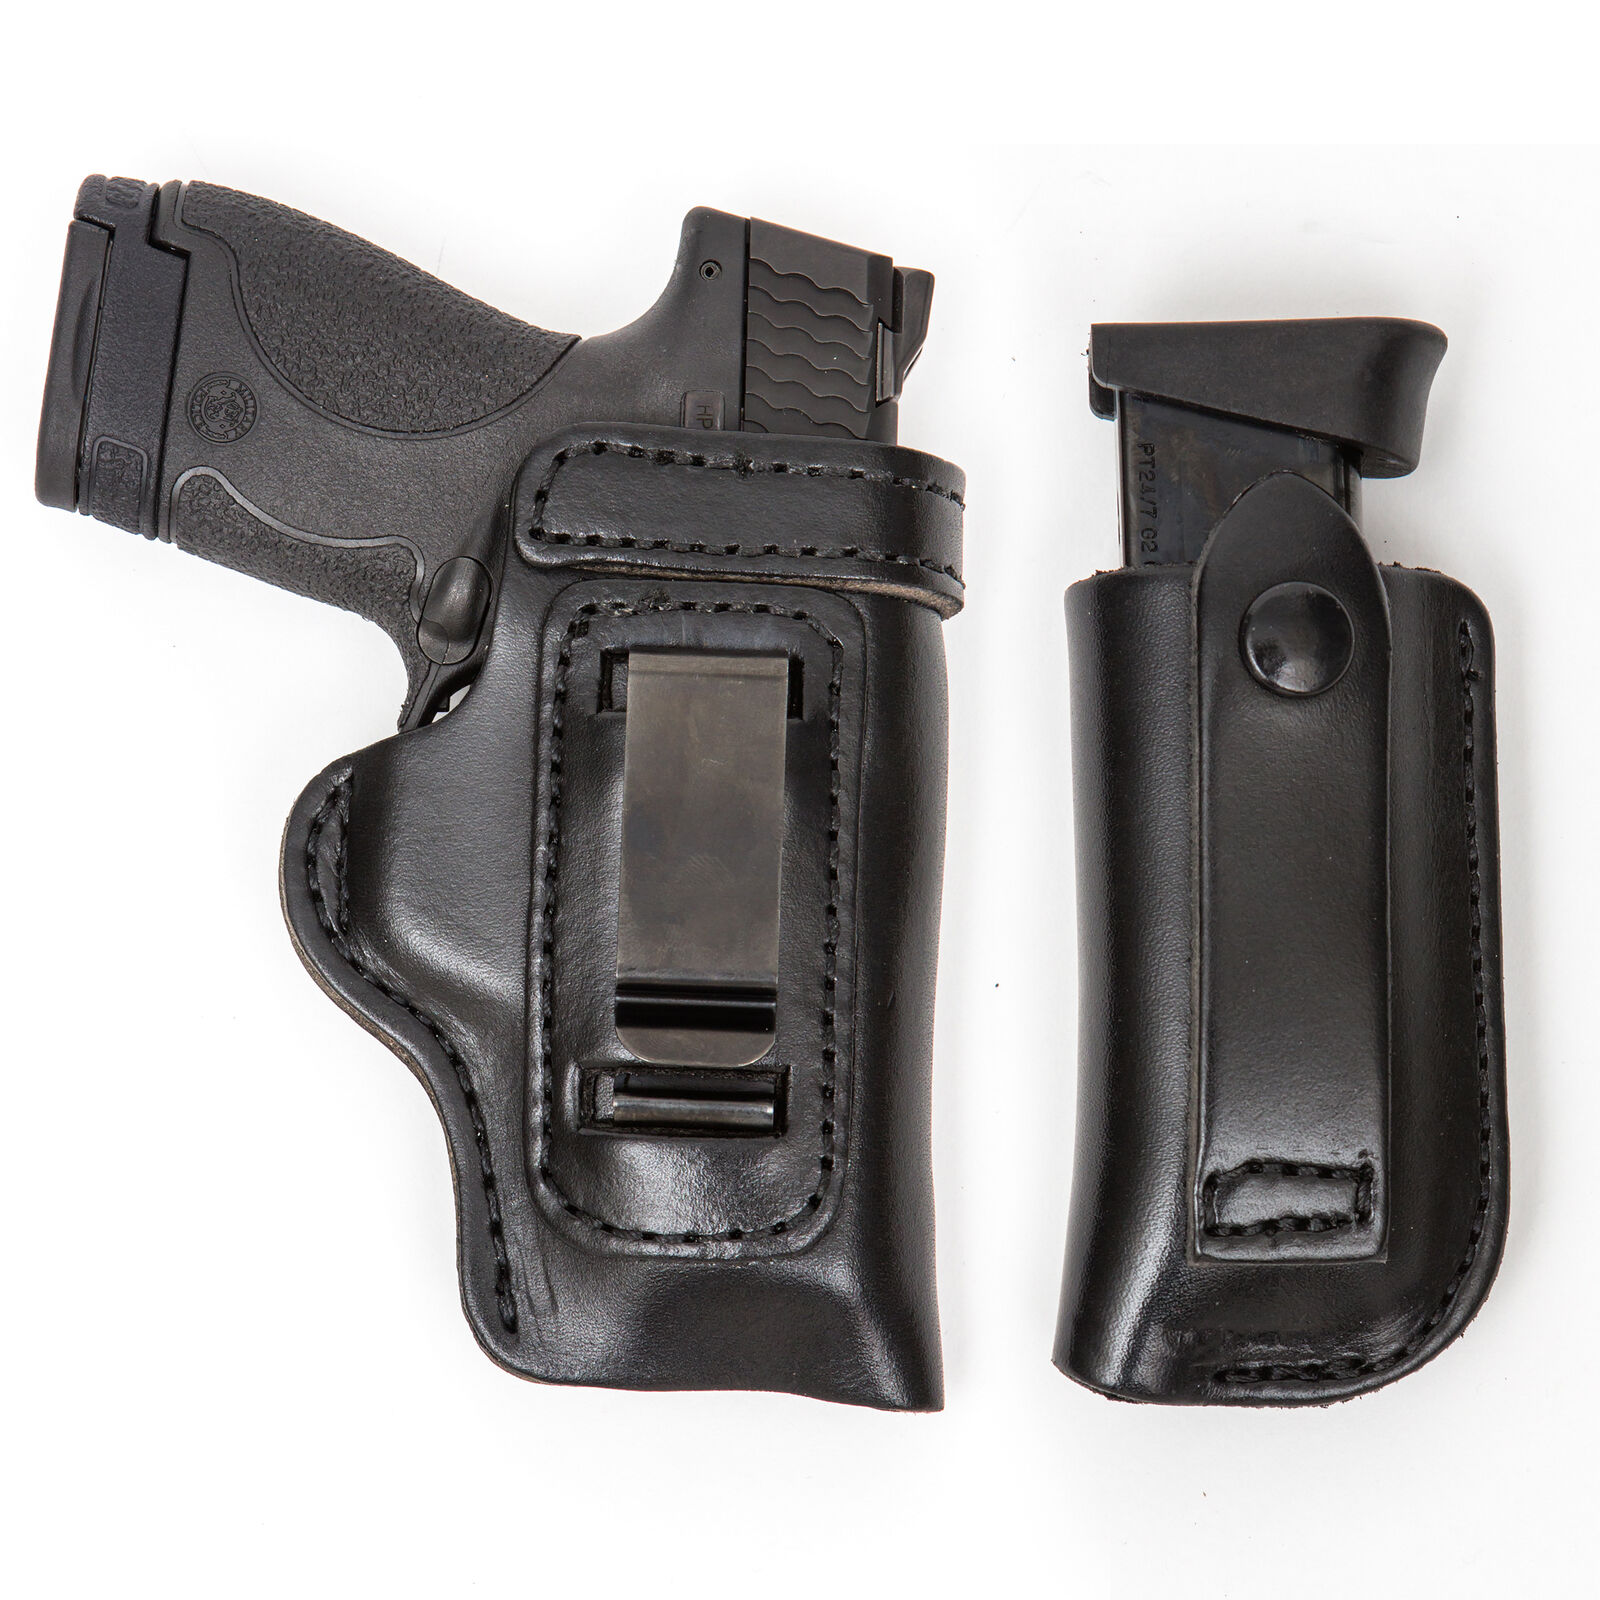 Combo Pack IWB owb RH LH Funda Pistola & Mag Para Dorar 1911 22 Compacto